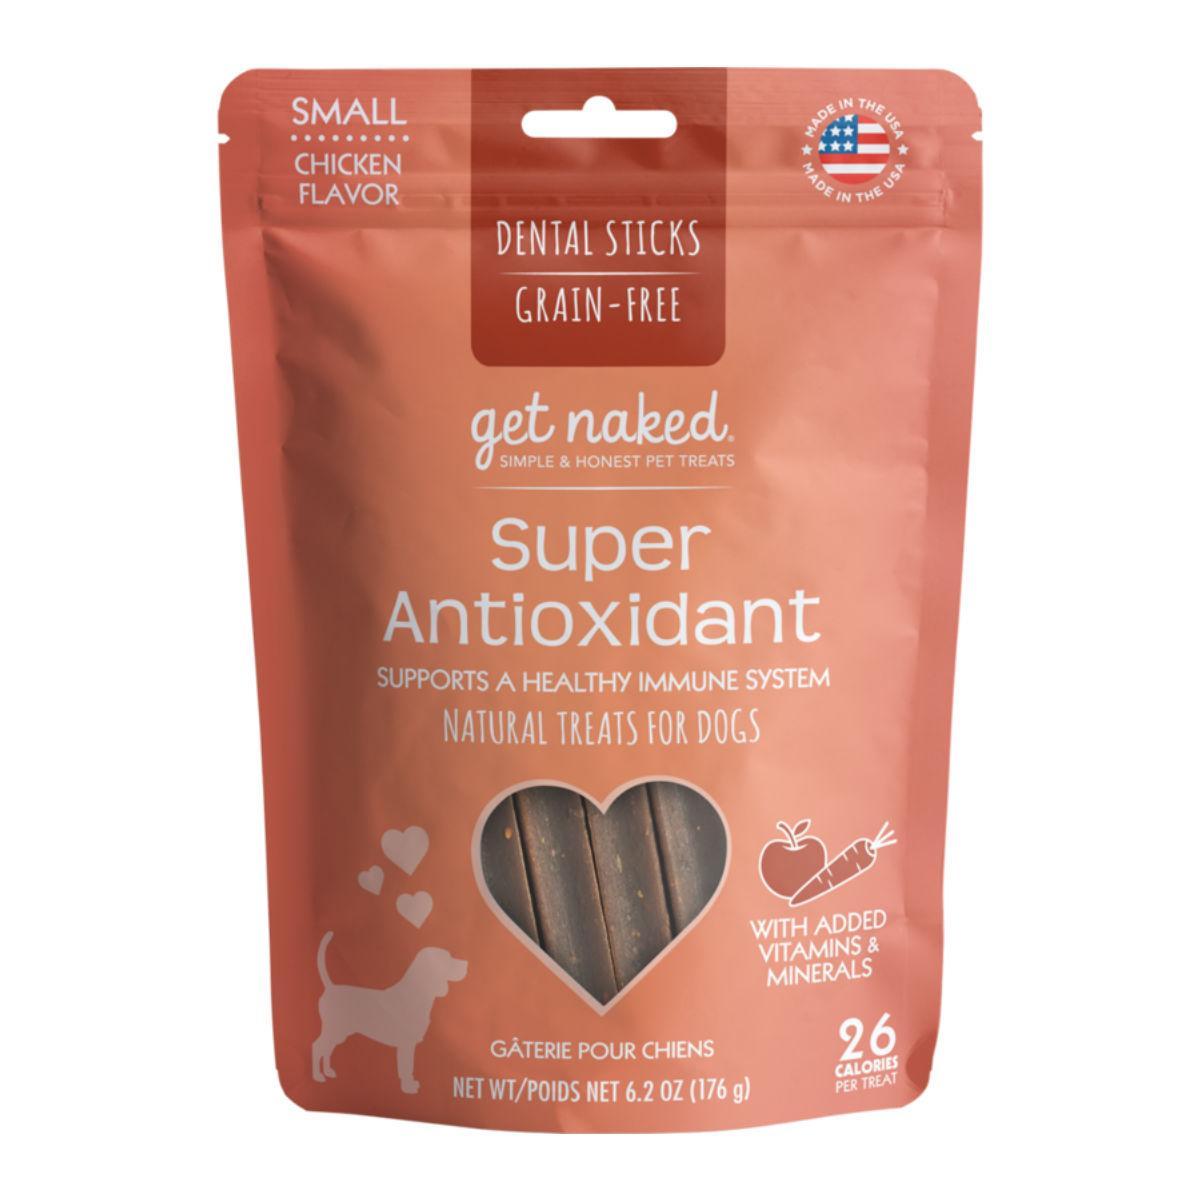 Get Naked Grain Free Dental Sticks Dog Treats - Super Antioxidant